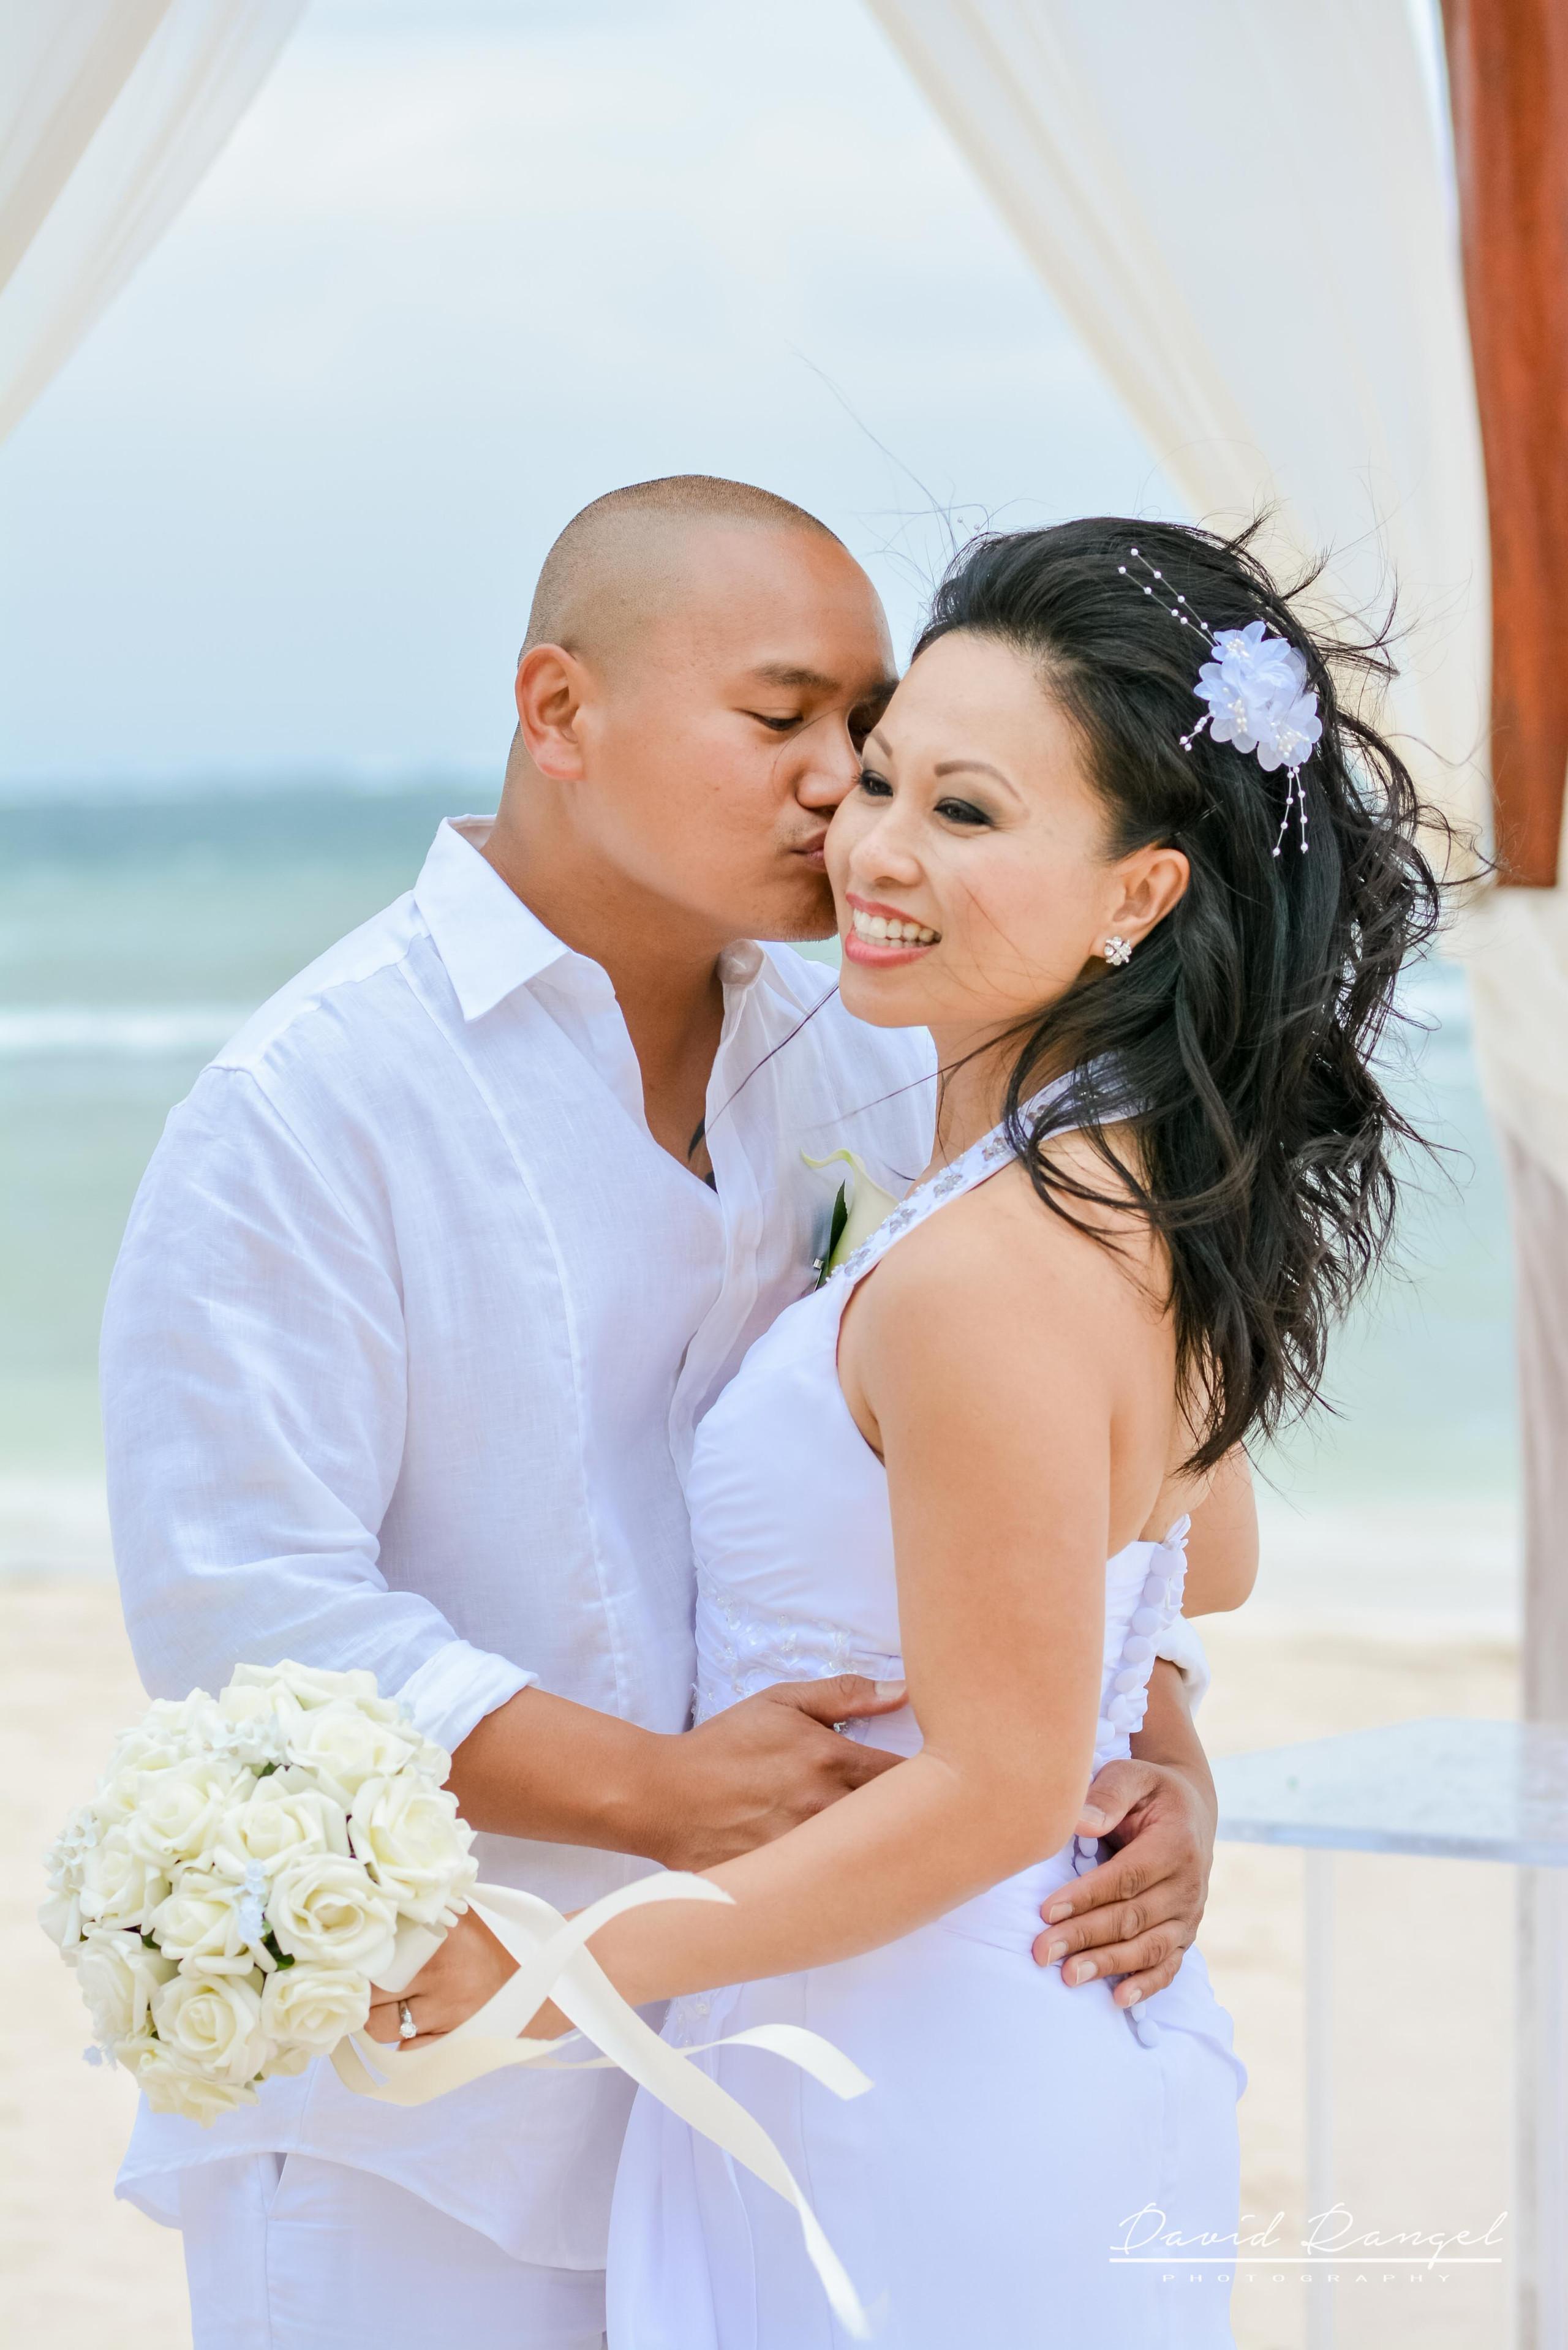 wedding+kiss